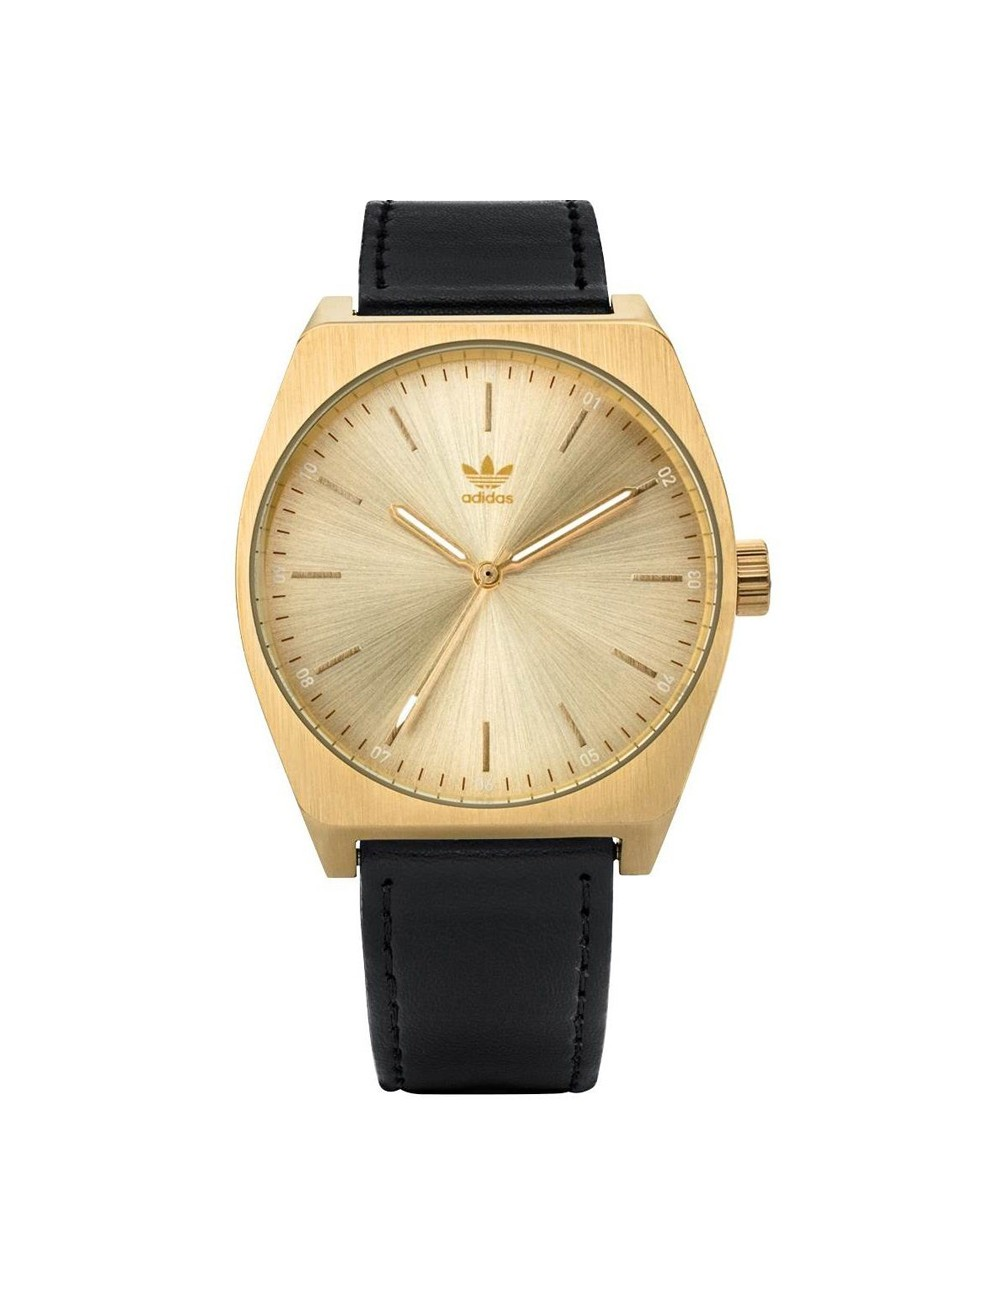 Pánske hodinky Adidas Process L1 Z05510